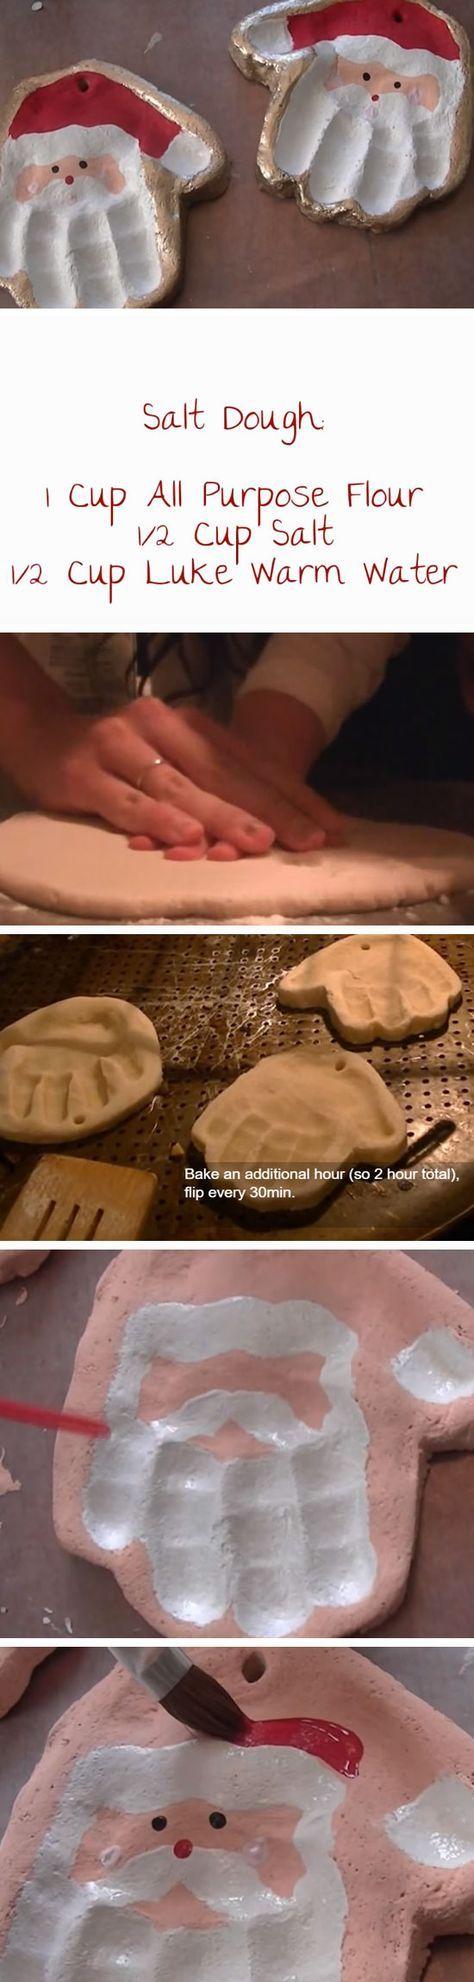 Salt Dough Santa Handprint   20+ DIY Christmas Crafts for Kids to Make